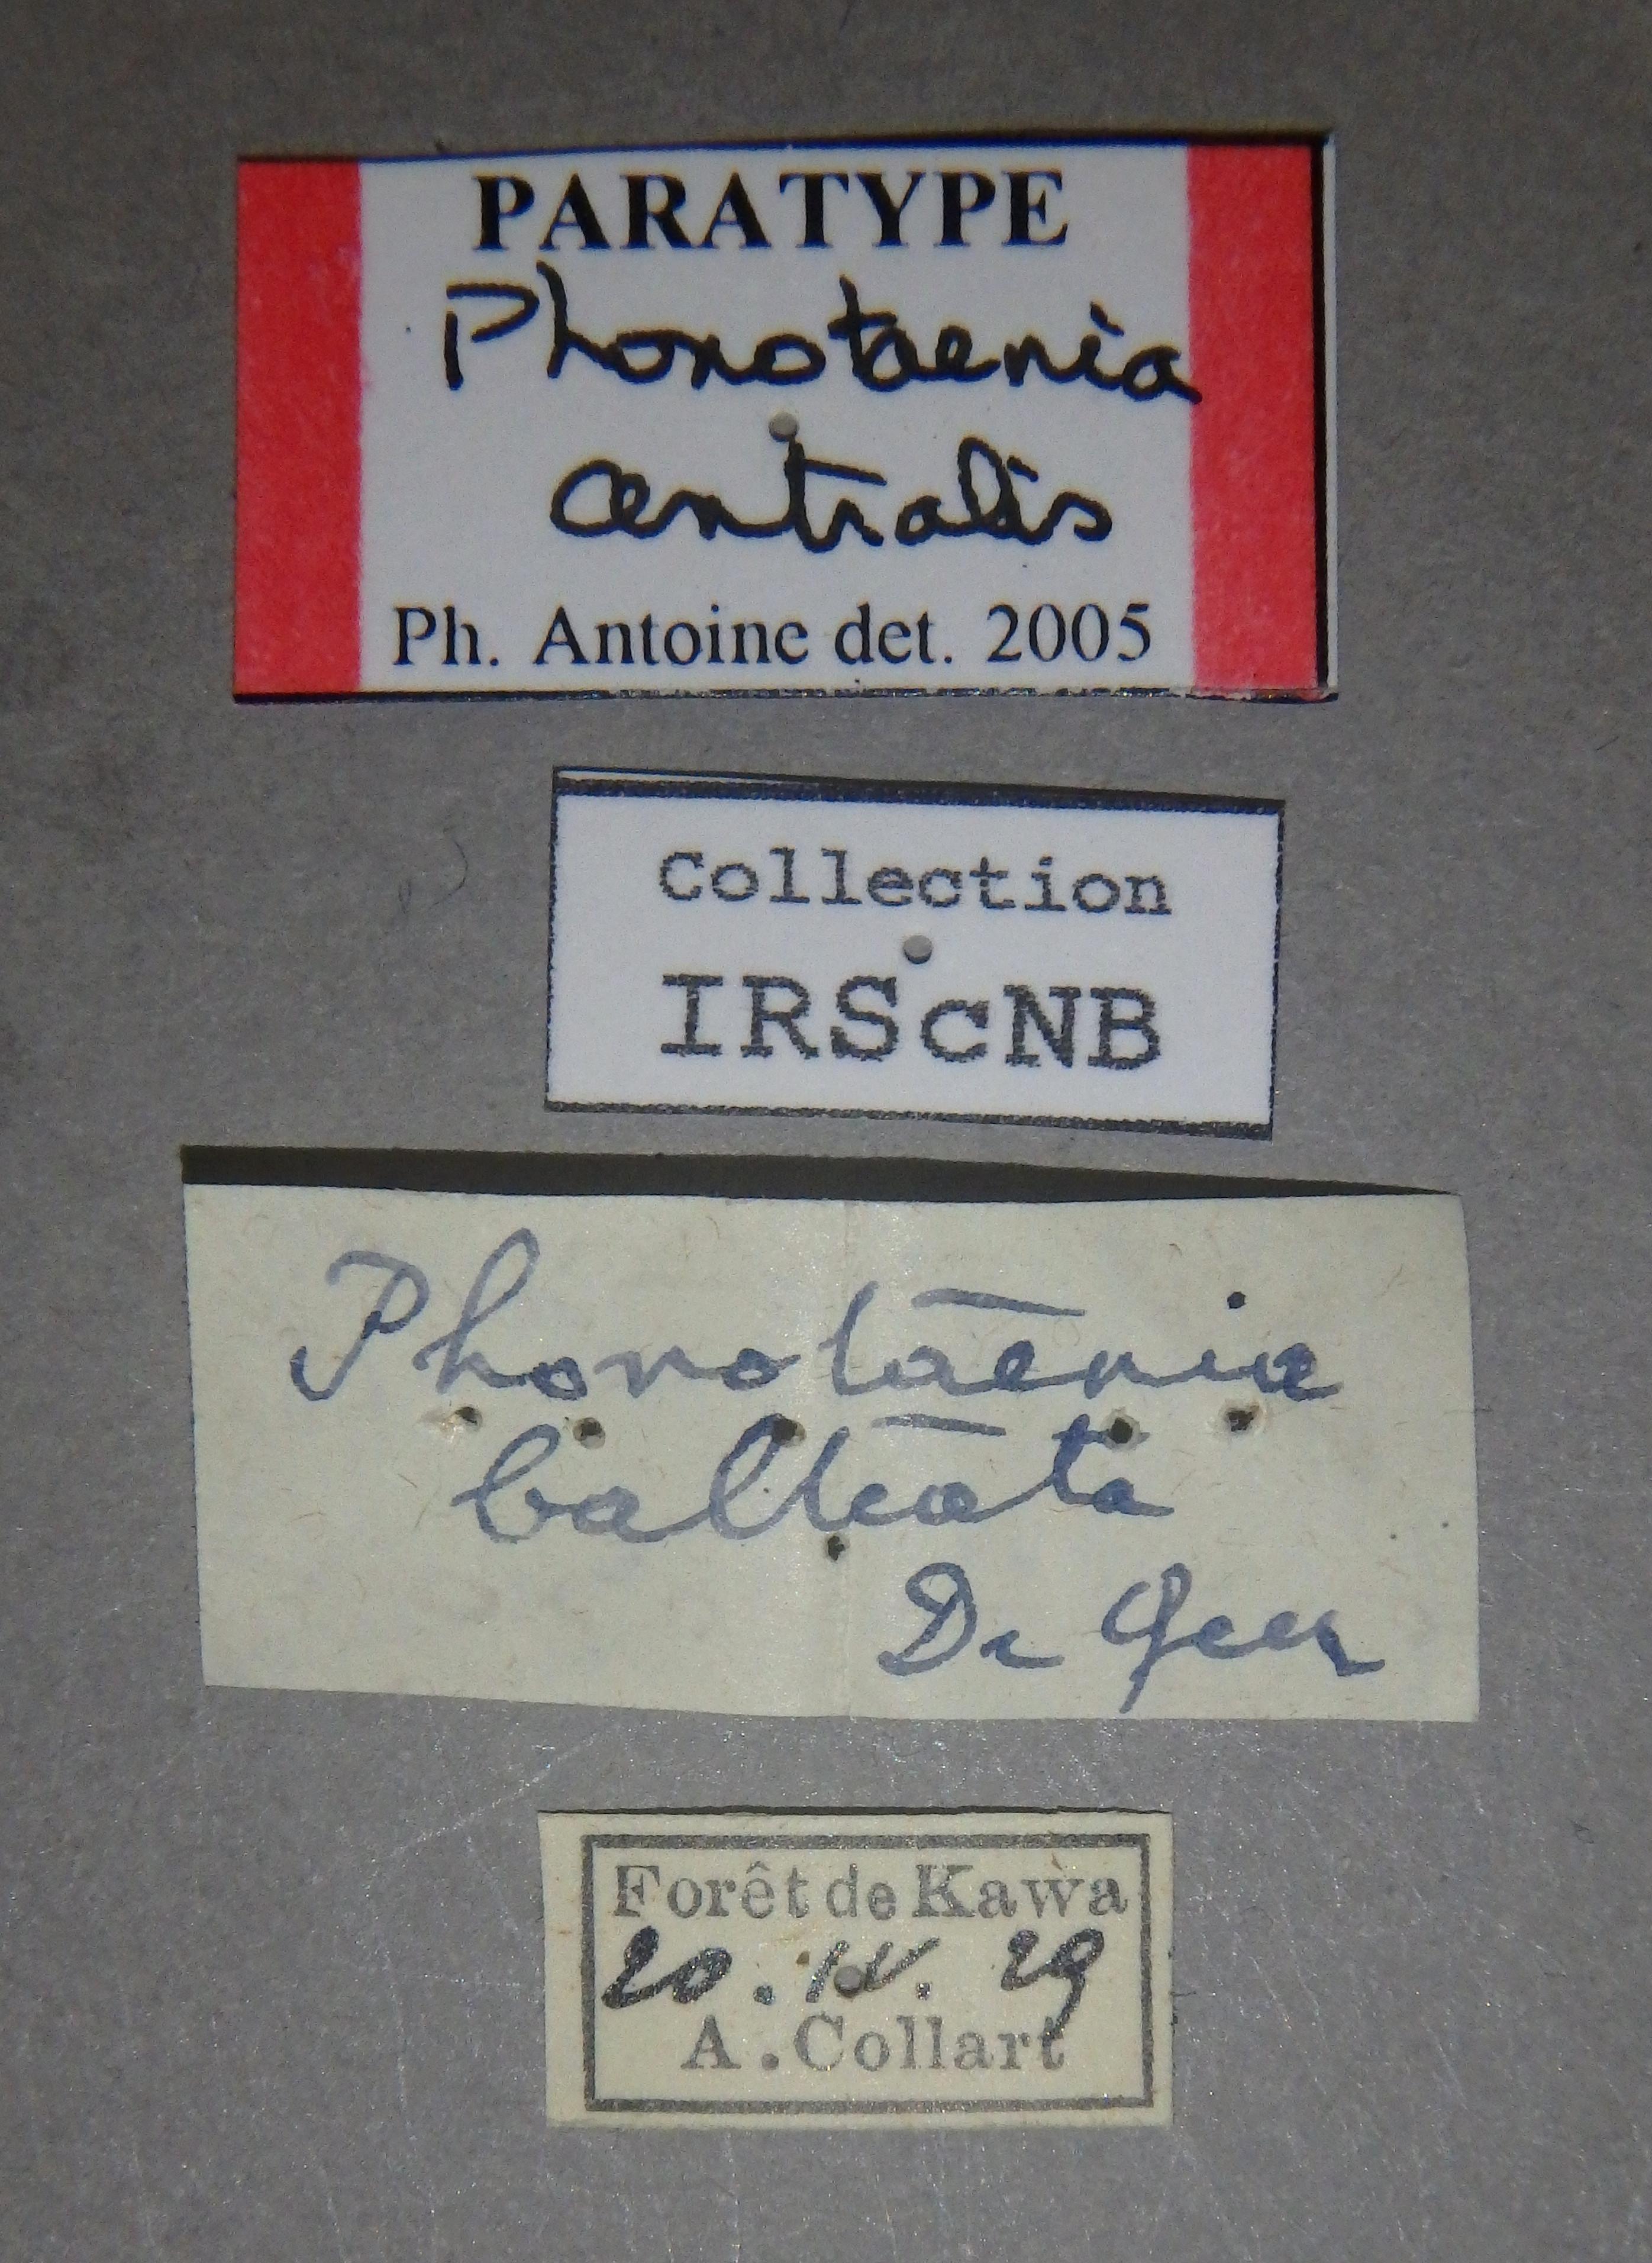 Phonotaenia centralis pt2 Lb.JPG